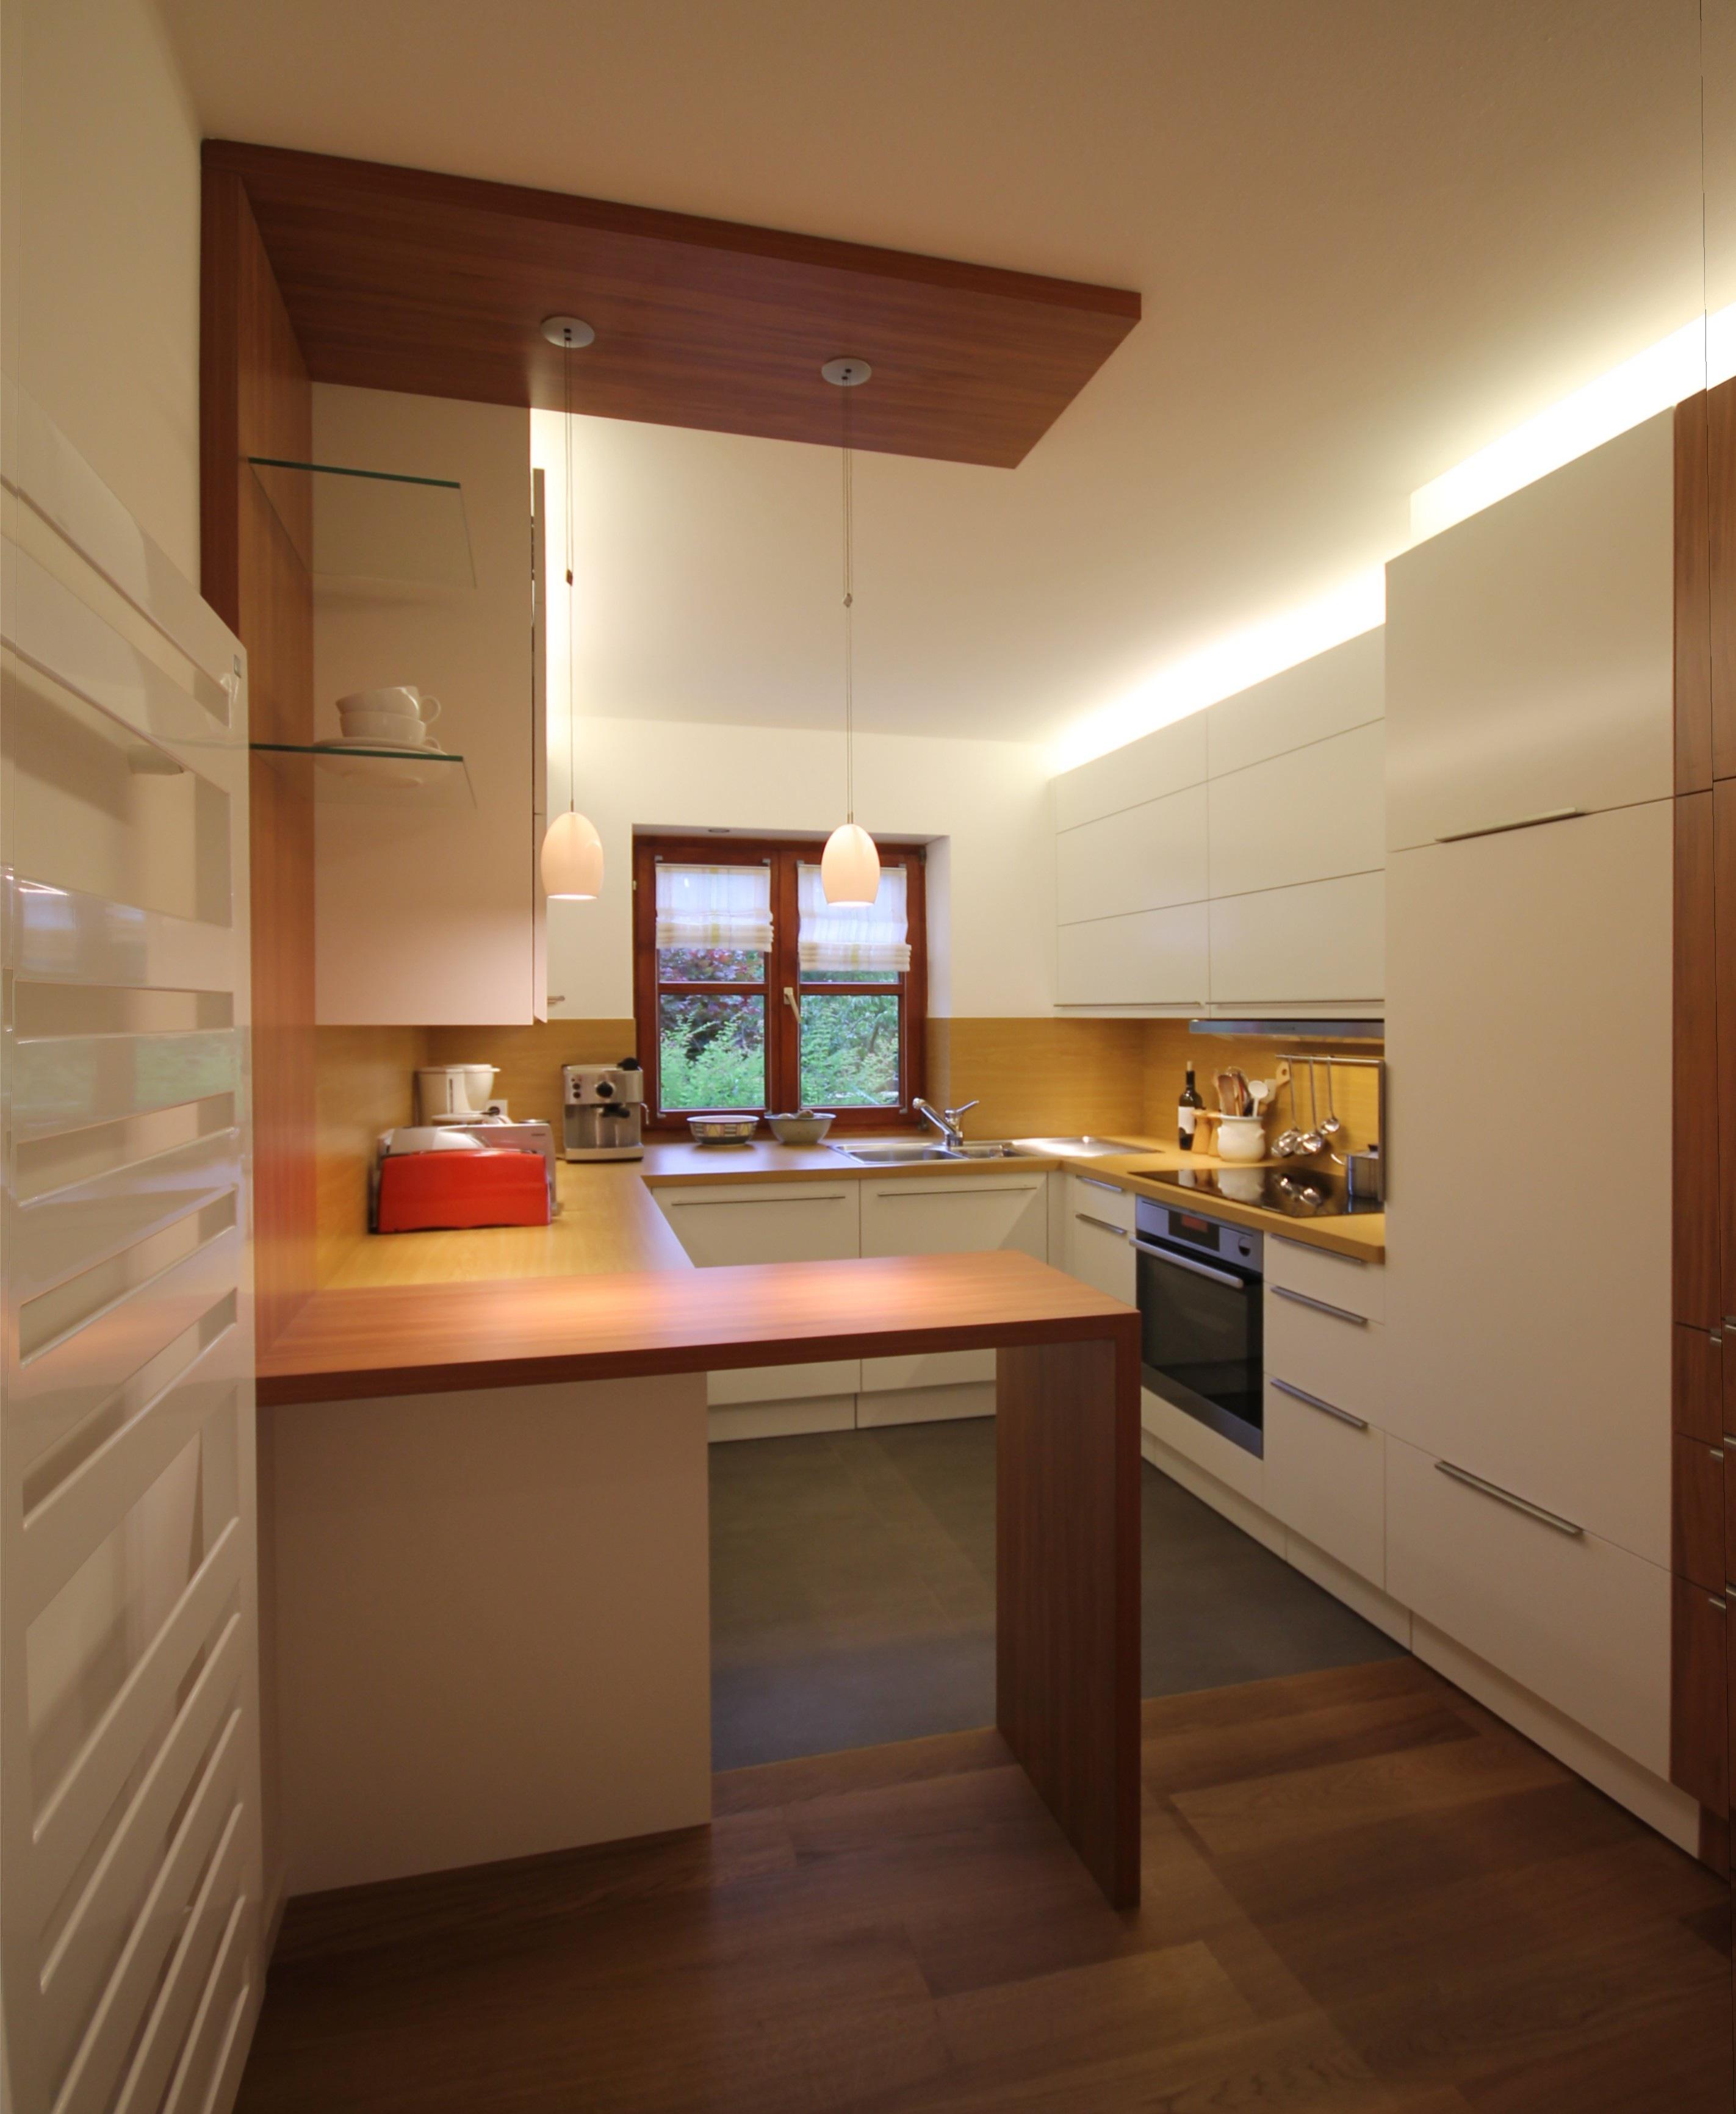 bett mit bettkasten. Black Bedroom Furniture Sets. Home Design Ideas